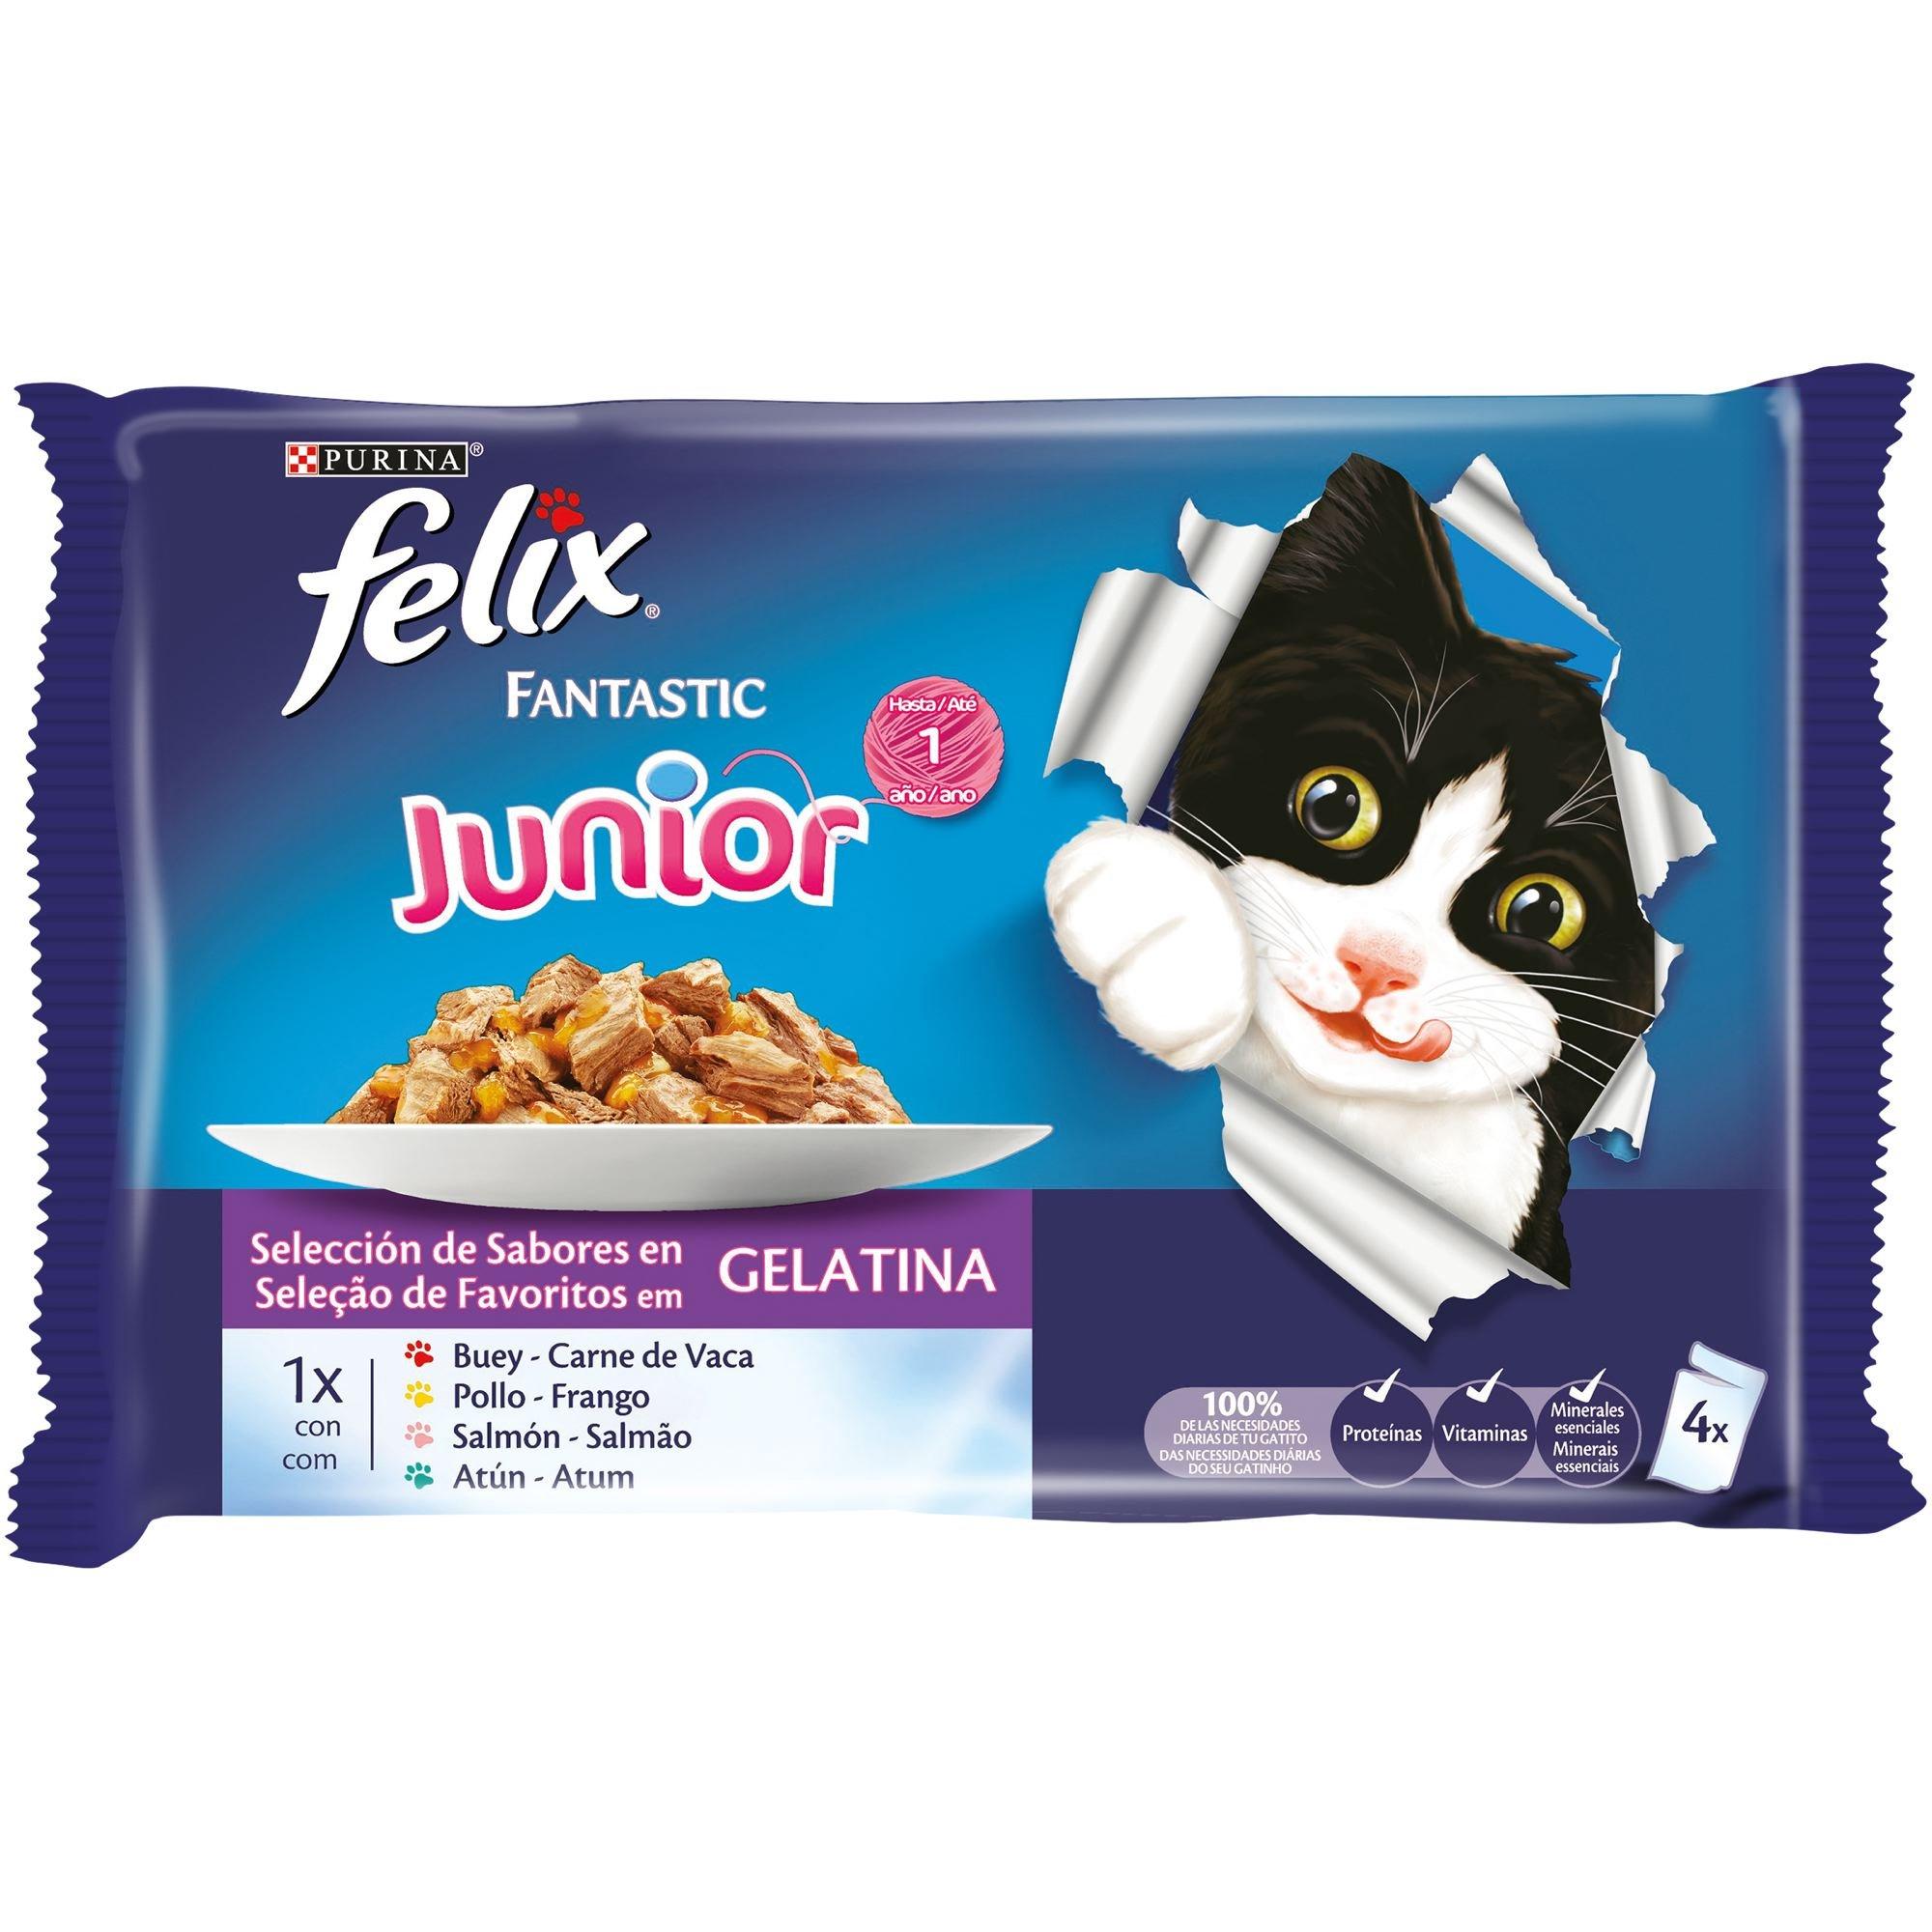 Purina Felix Fantastic comida para gato Junior Selecciones Favoritas 10 x [4 x 100 g]